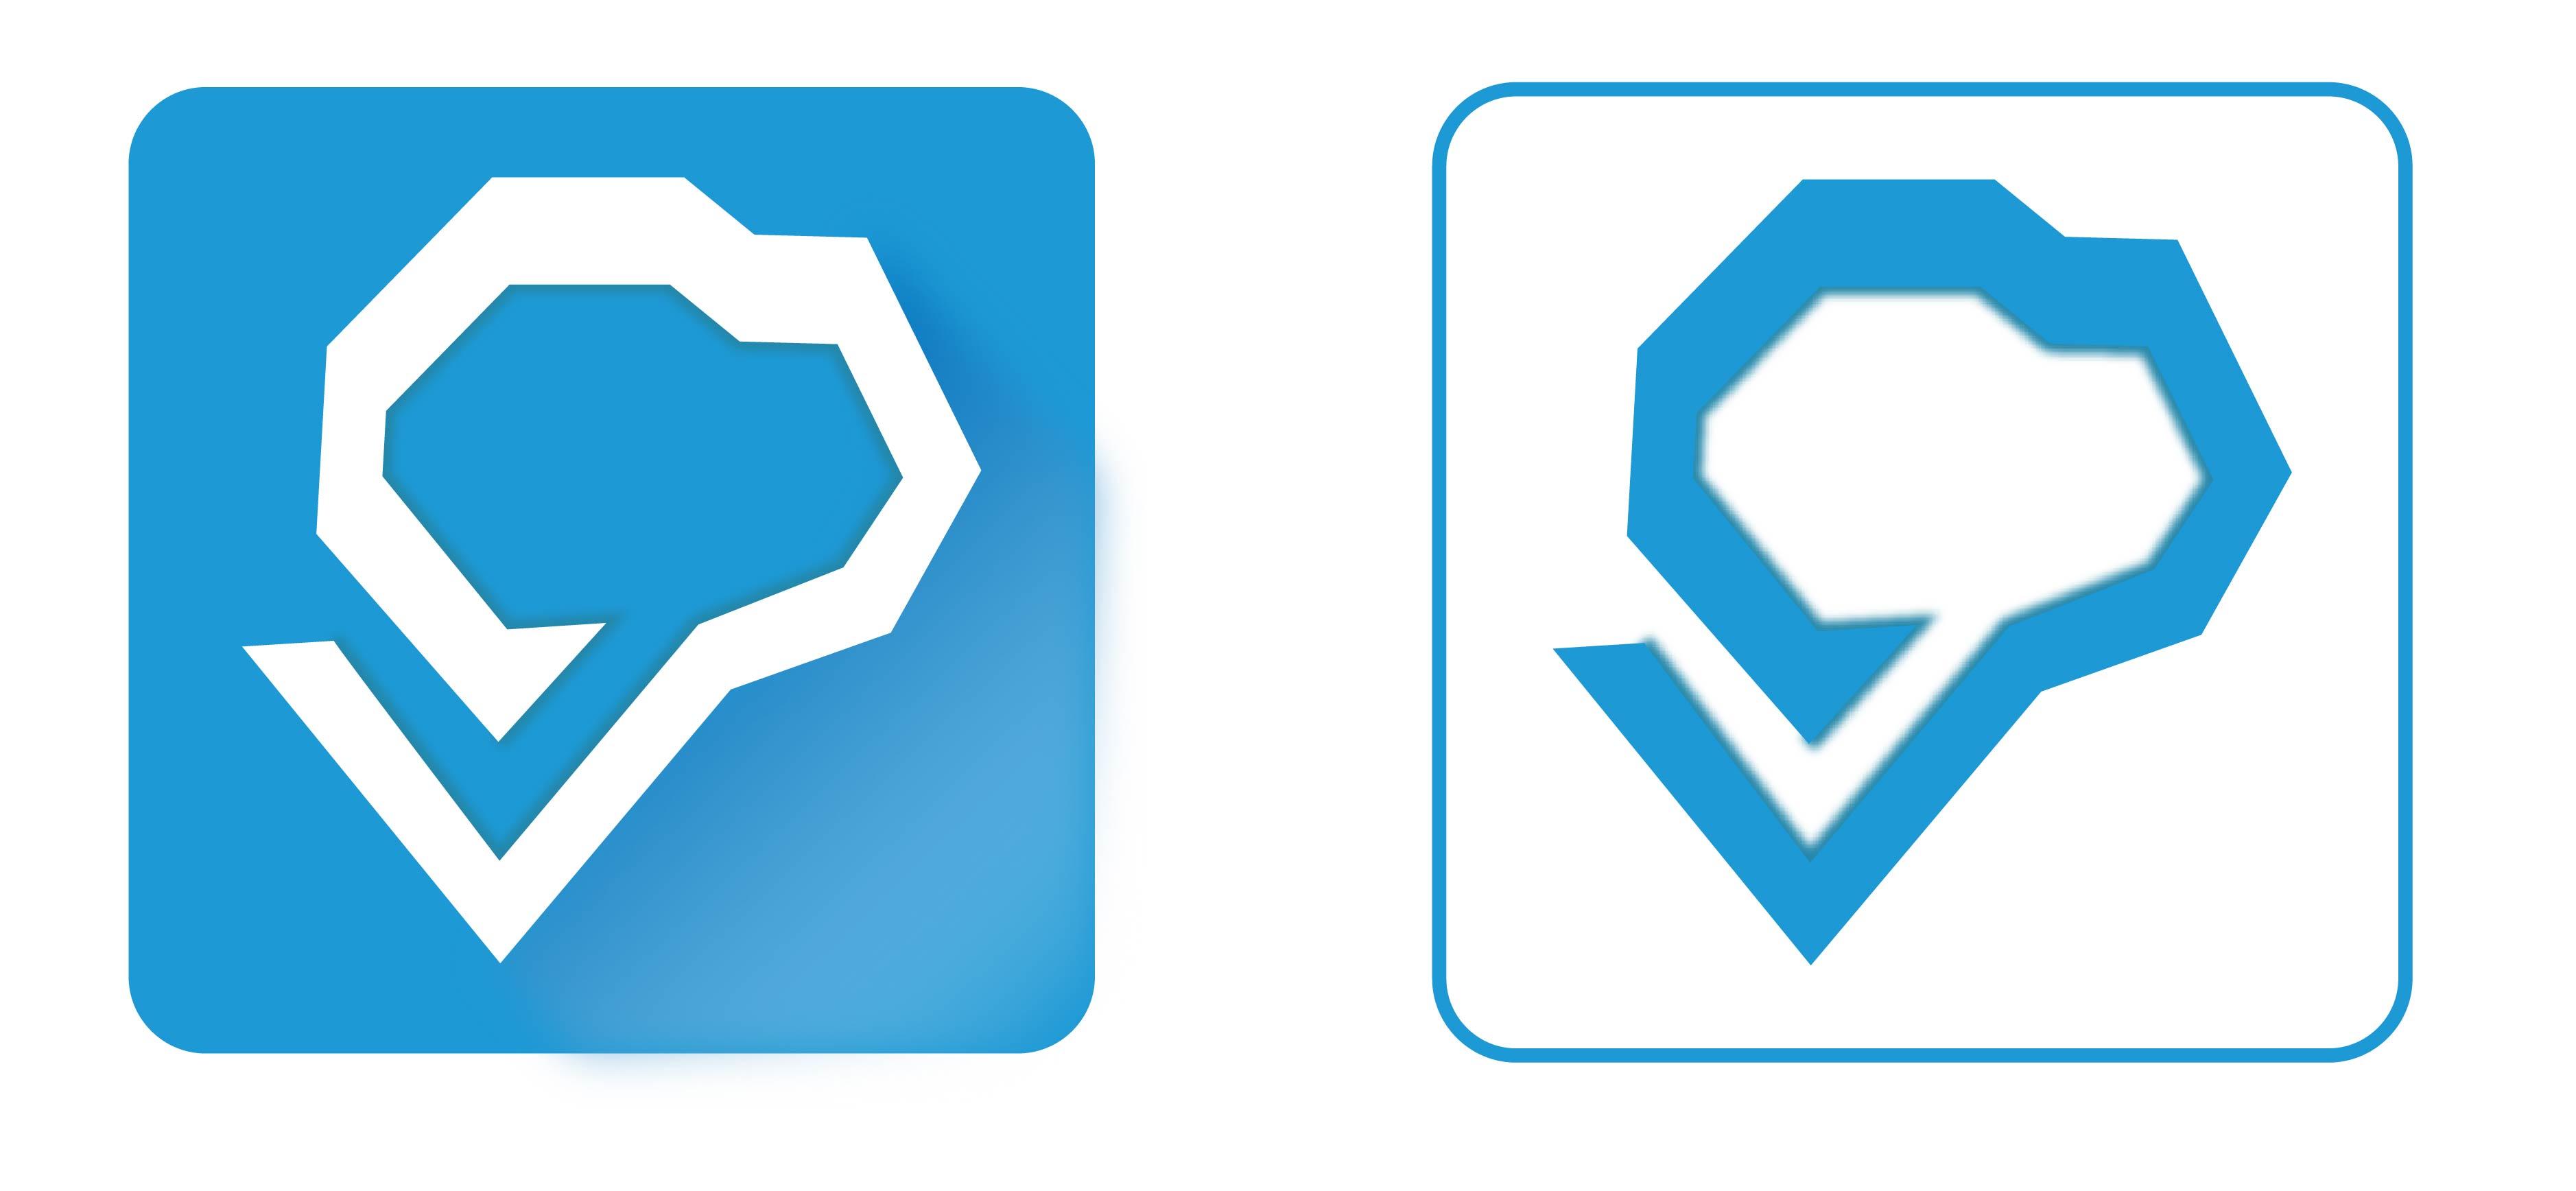 Логотип / иконка сервиса управления проектами / задачами фото f_7845975cefdbe2b5.jpg